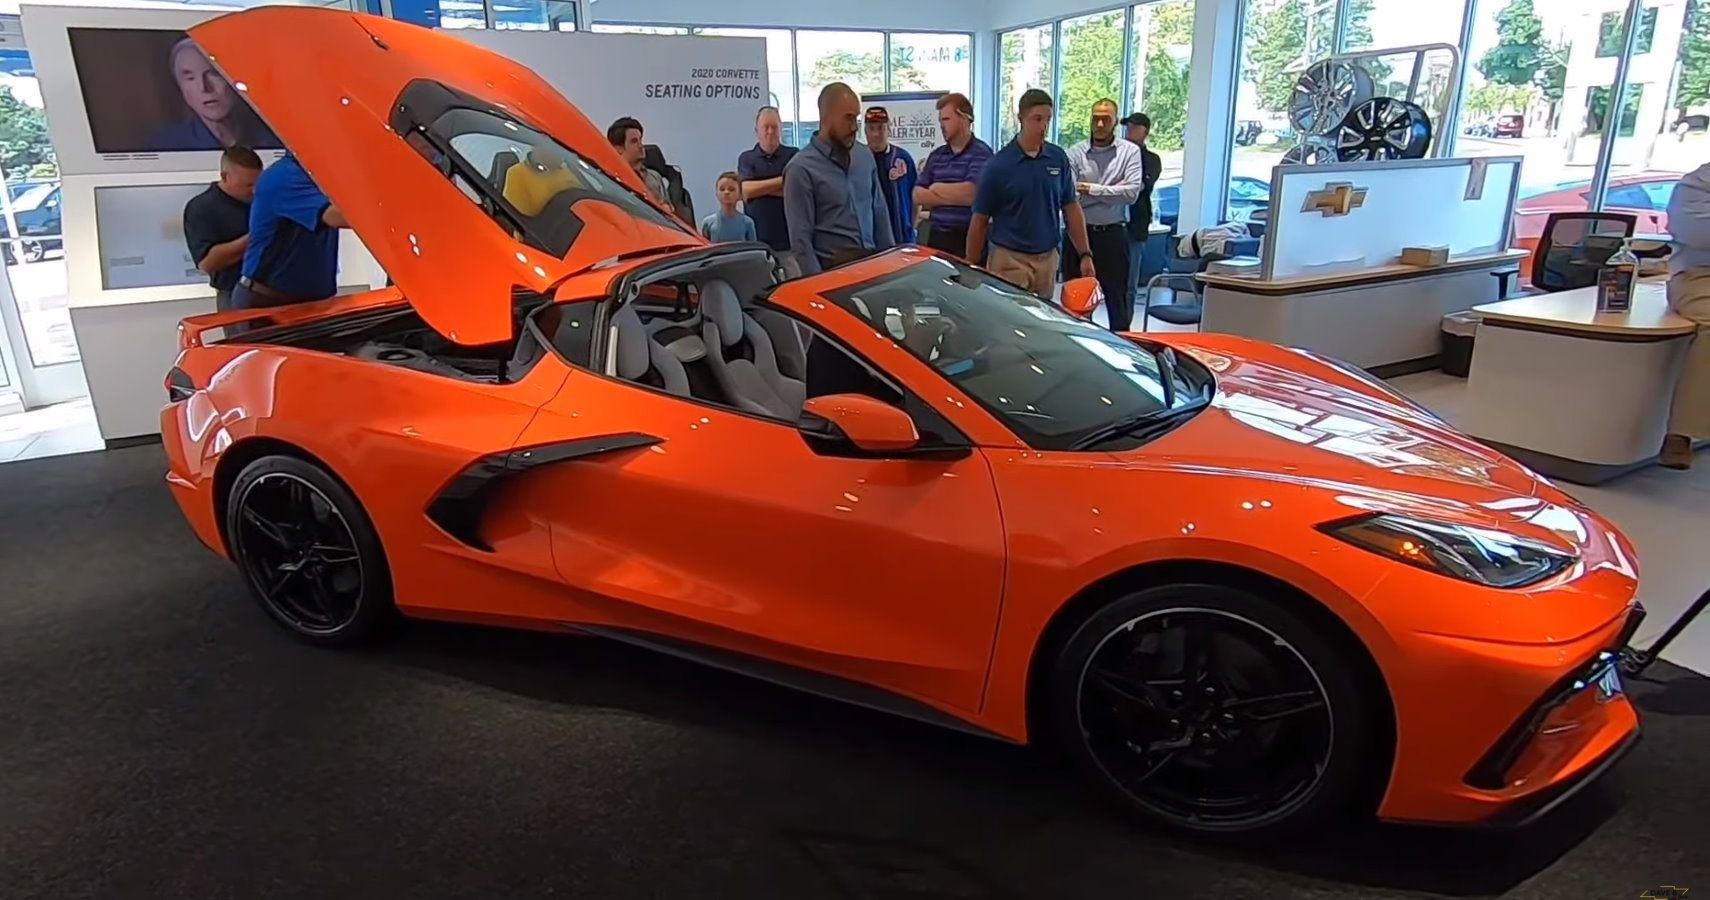 Get Inside The 2020 Chevy Corvette Stingray's Engine Bay ...